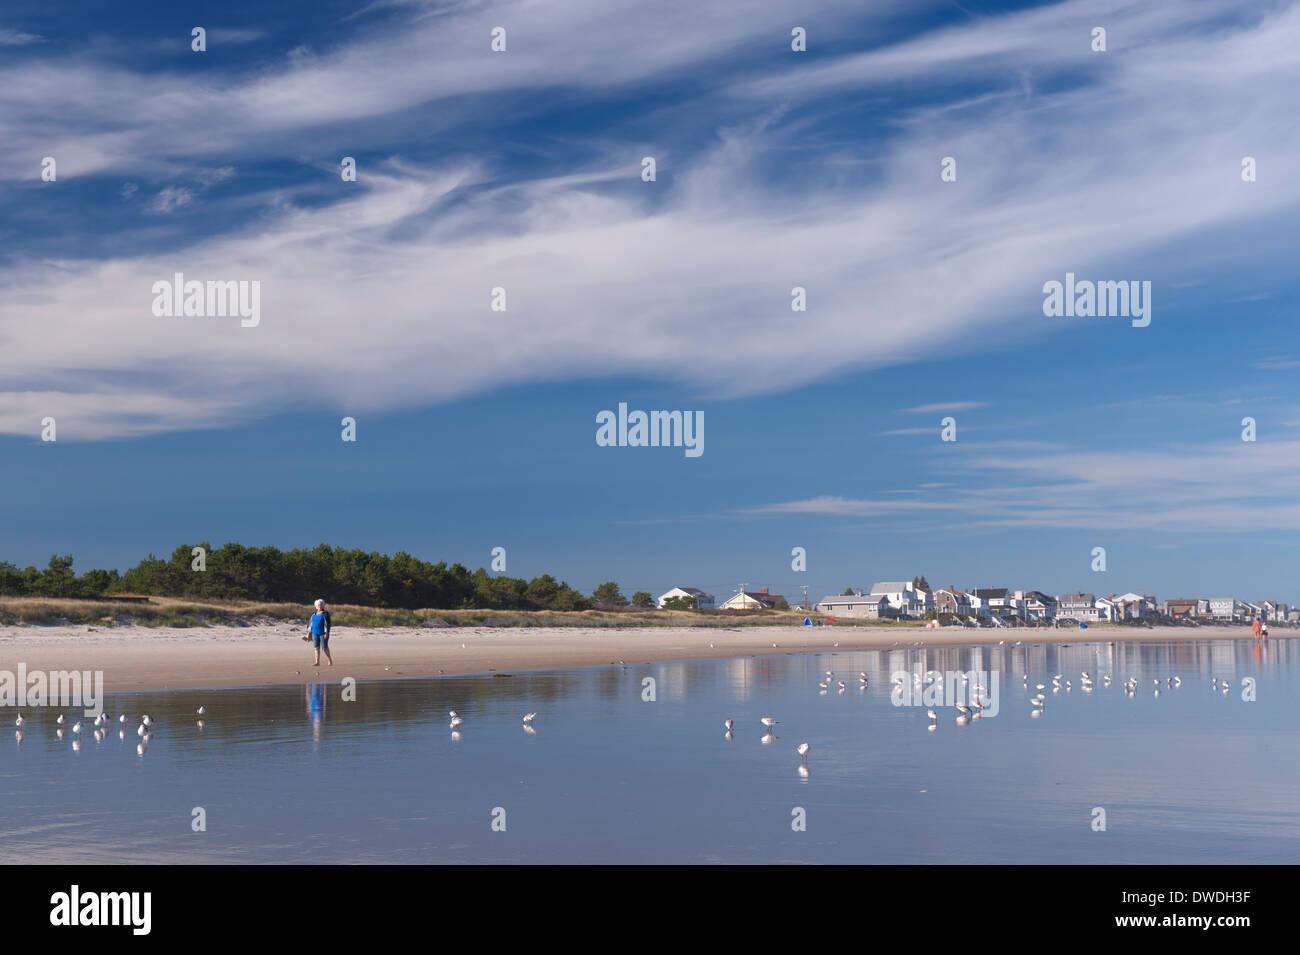 senior-woman-walking-on-the-beach-in-moody-maine-usa-DWDH3F.jpg